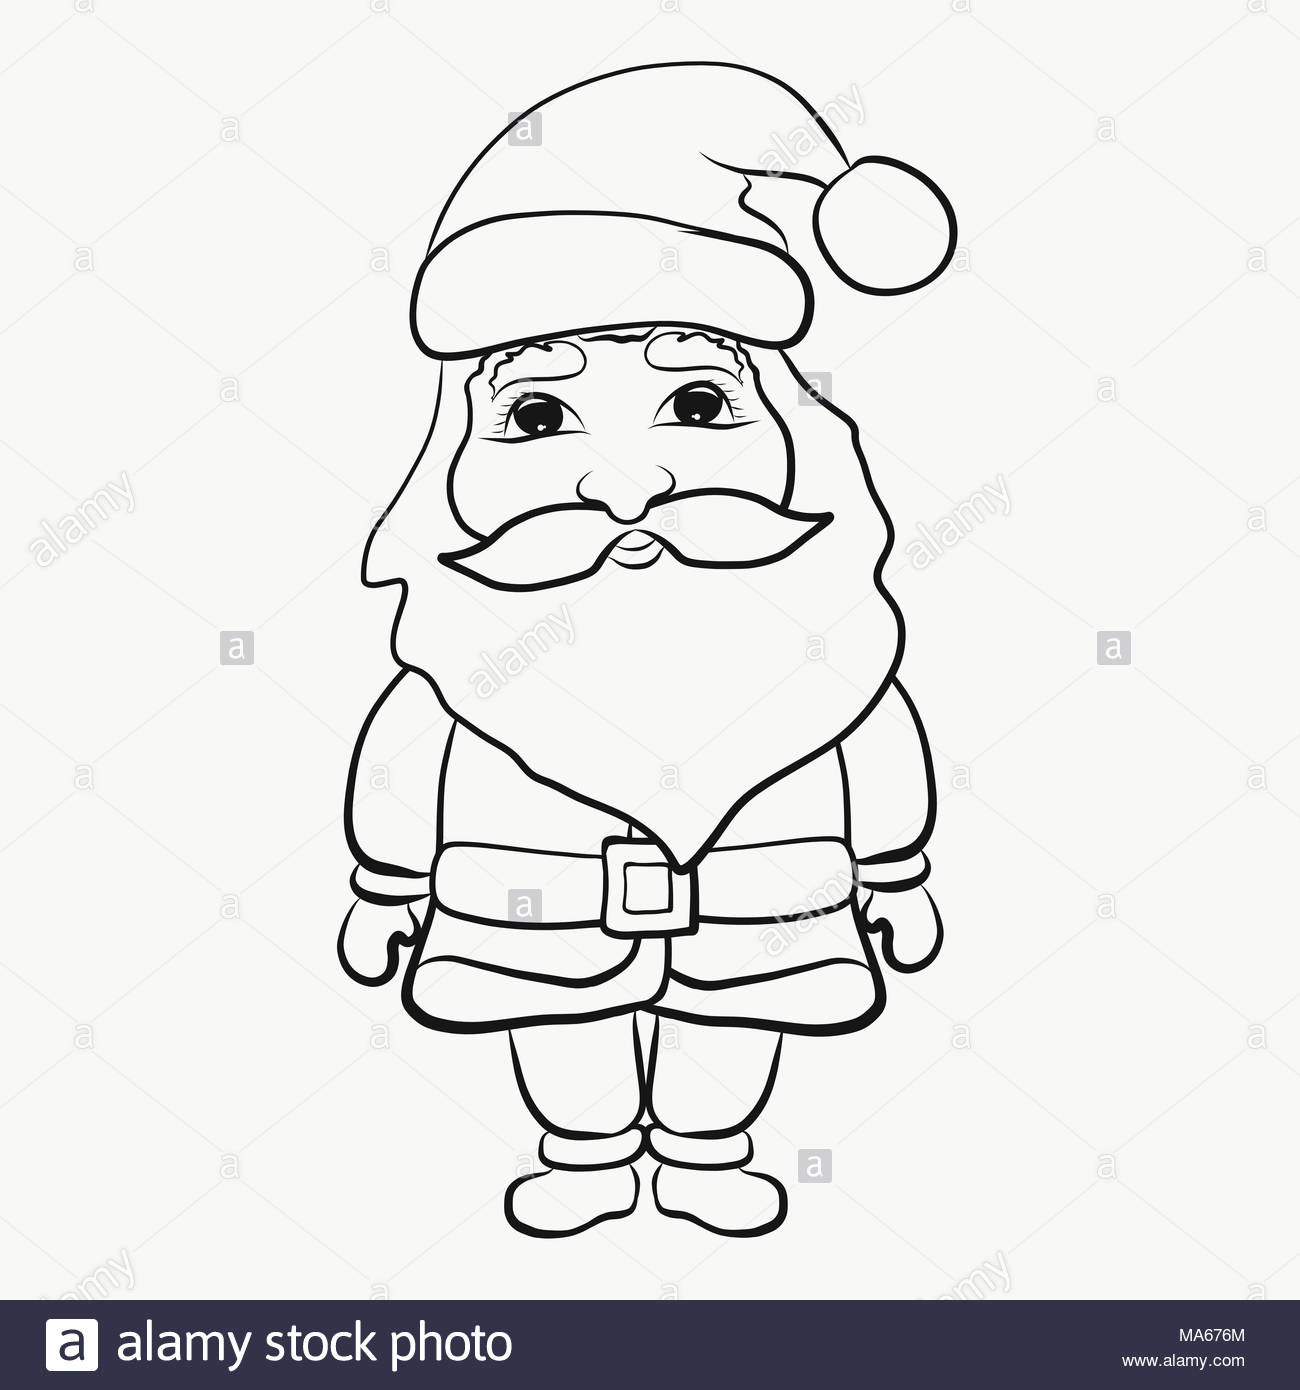 Children S Coloring Funny Santa Claus Stock Photo 178387628 Alamy